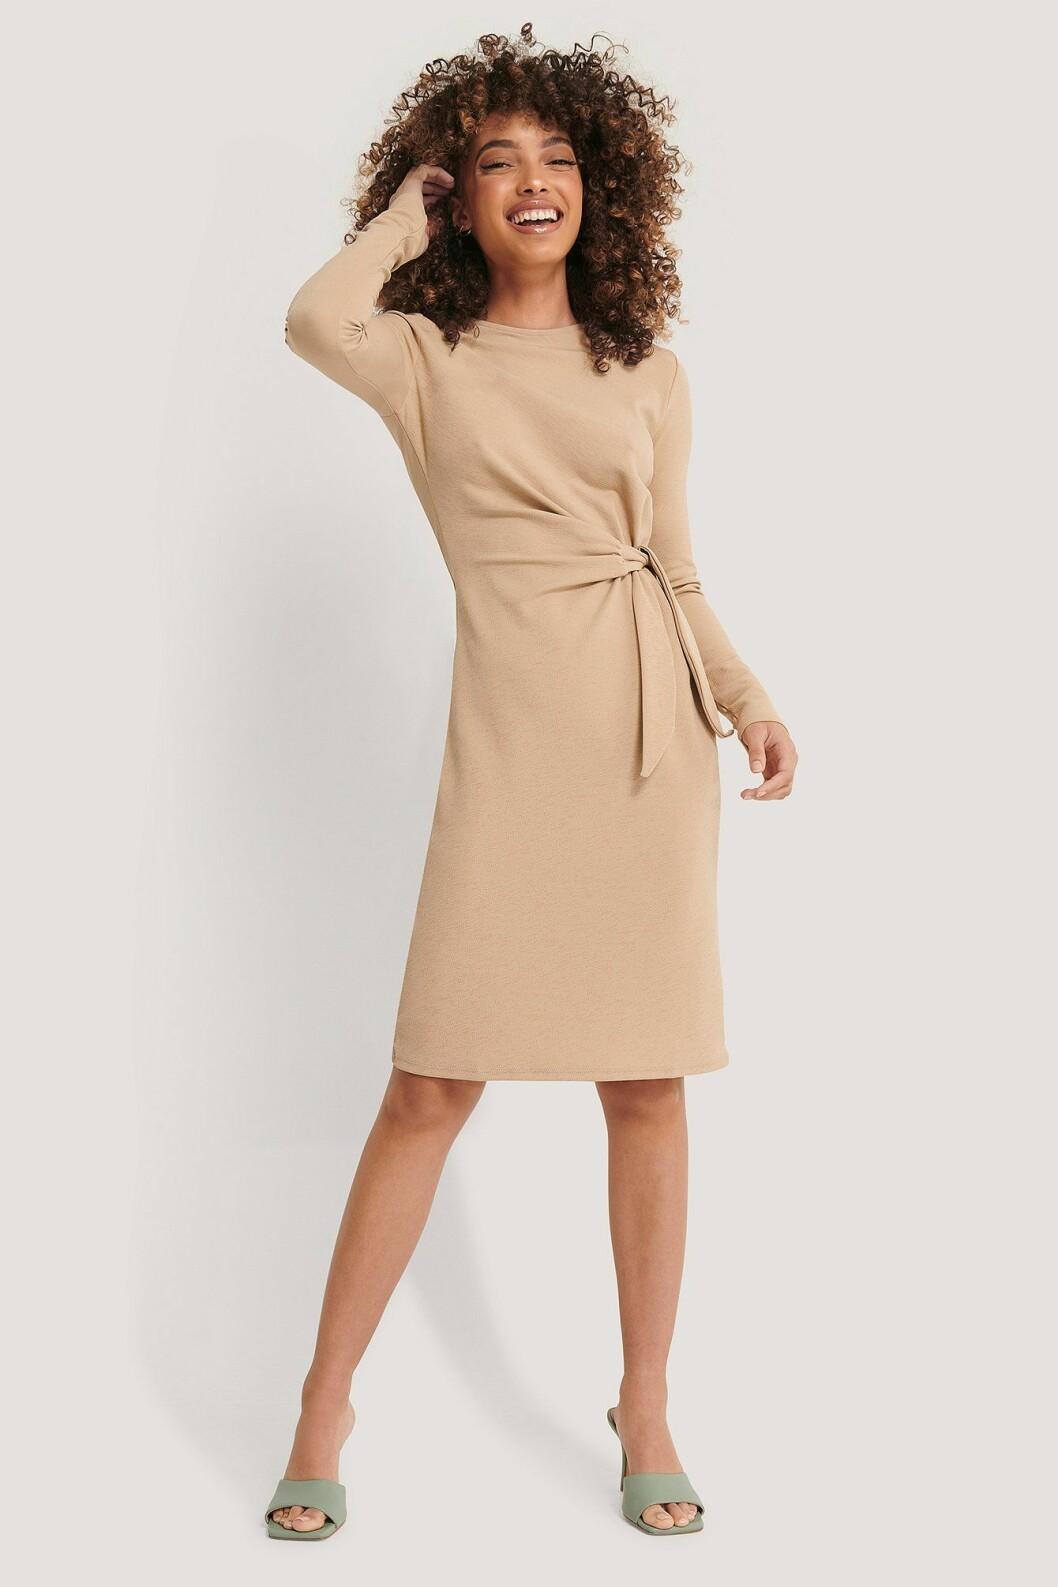 Imane Asry x Na-kd: Beige klänning